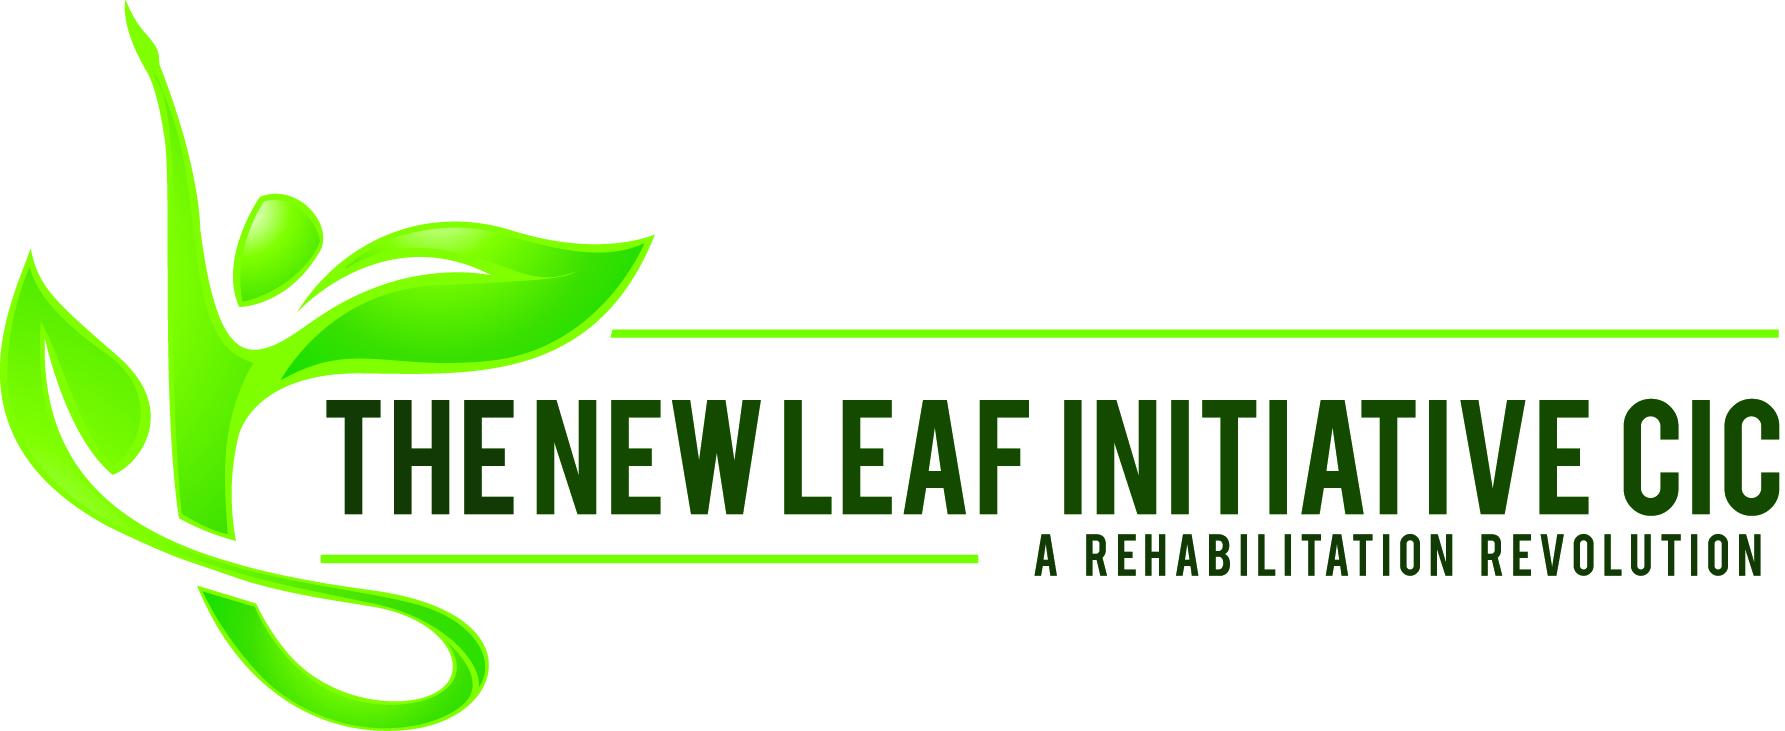 The New Leaf Initiative C.I.C